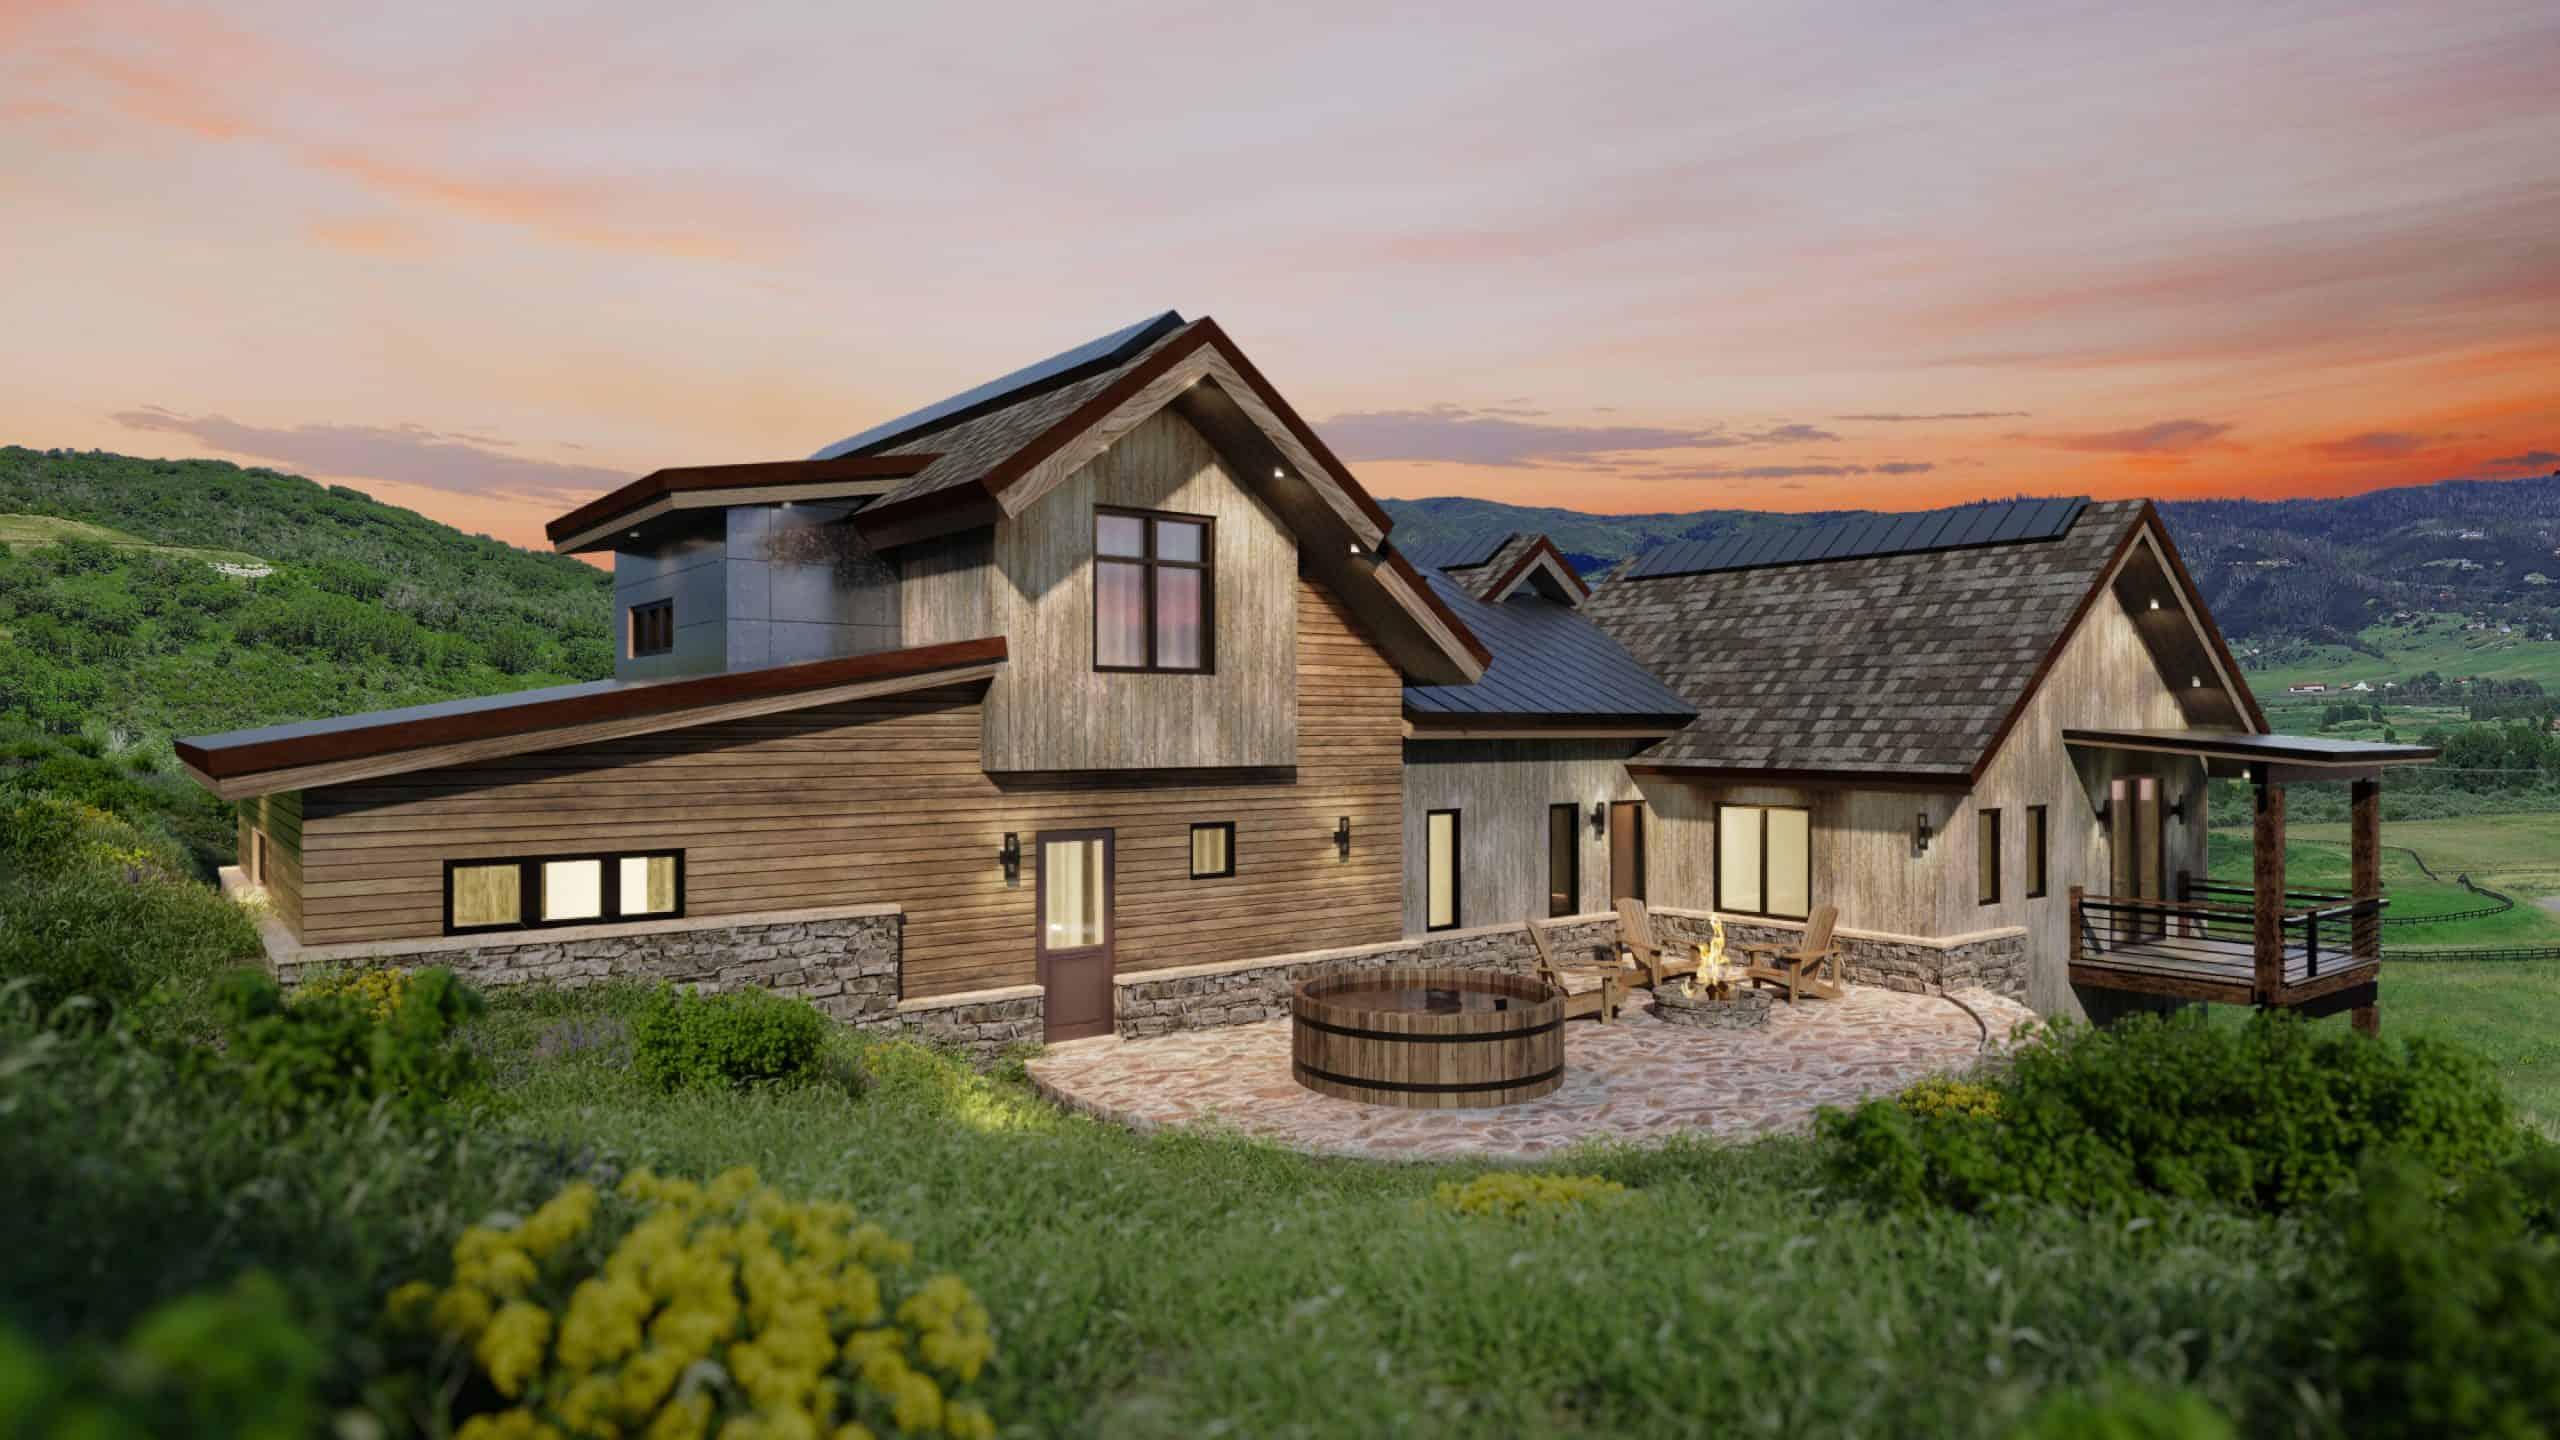 lot 44 spring 2 scaled - Construction Update: Market Home Spotlight